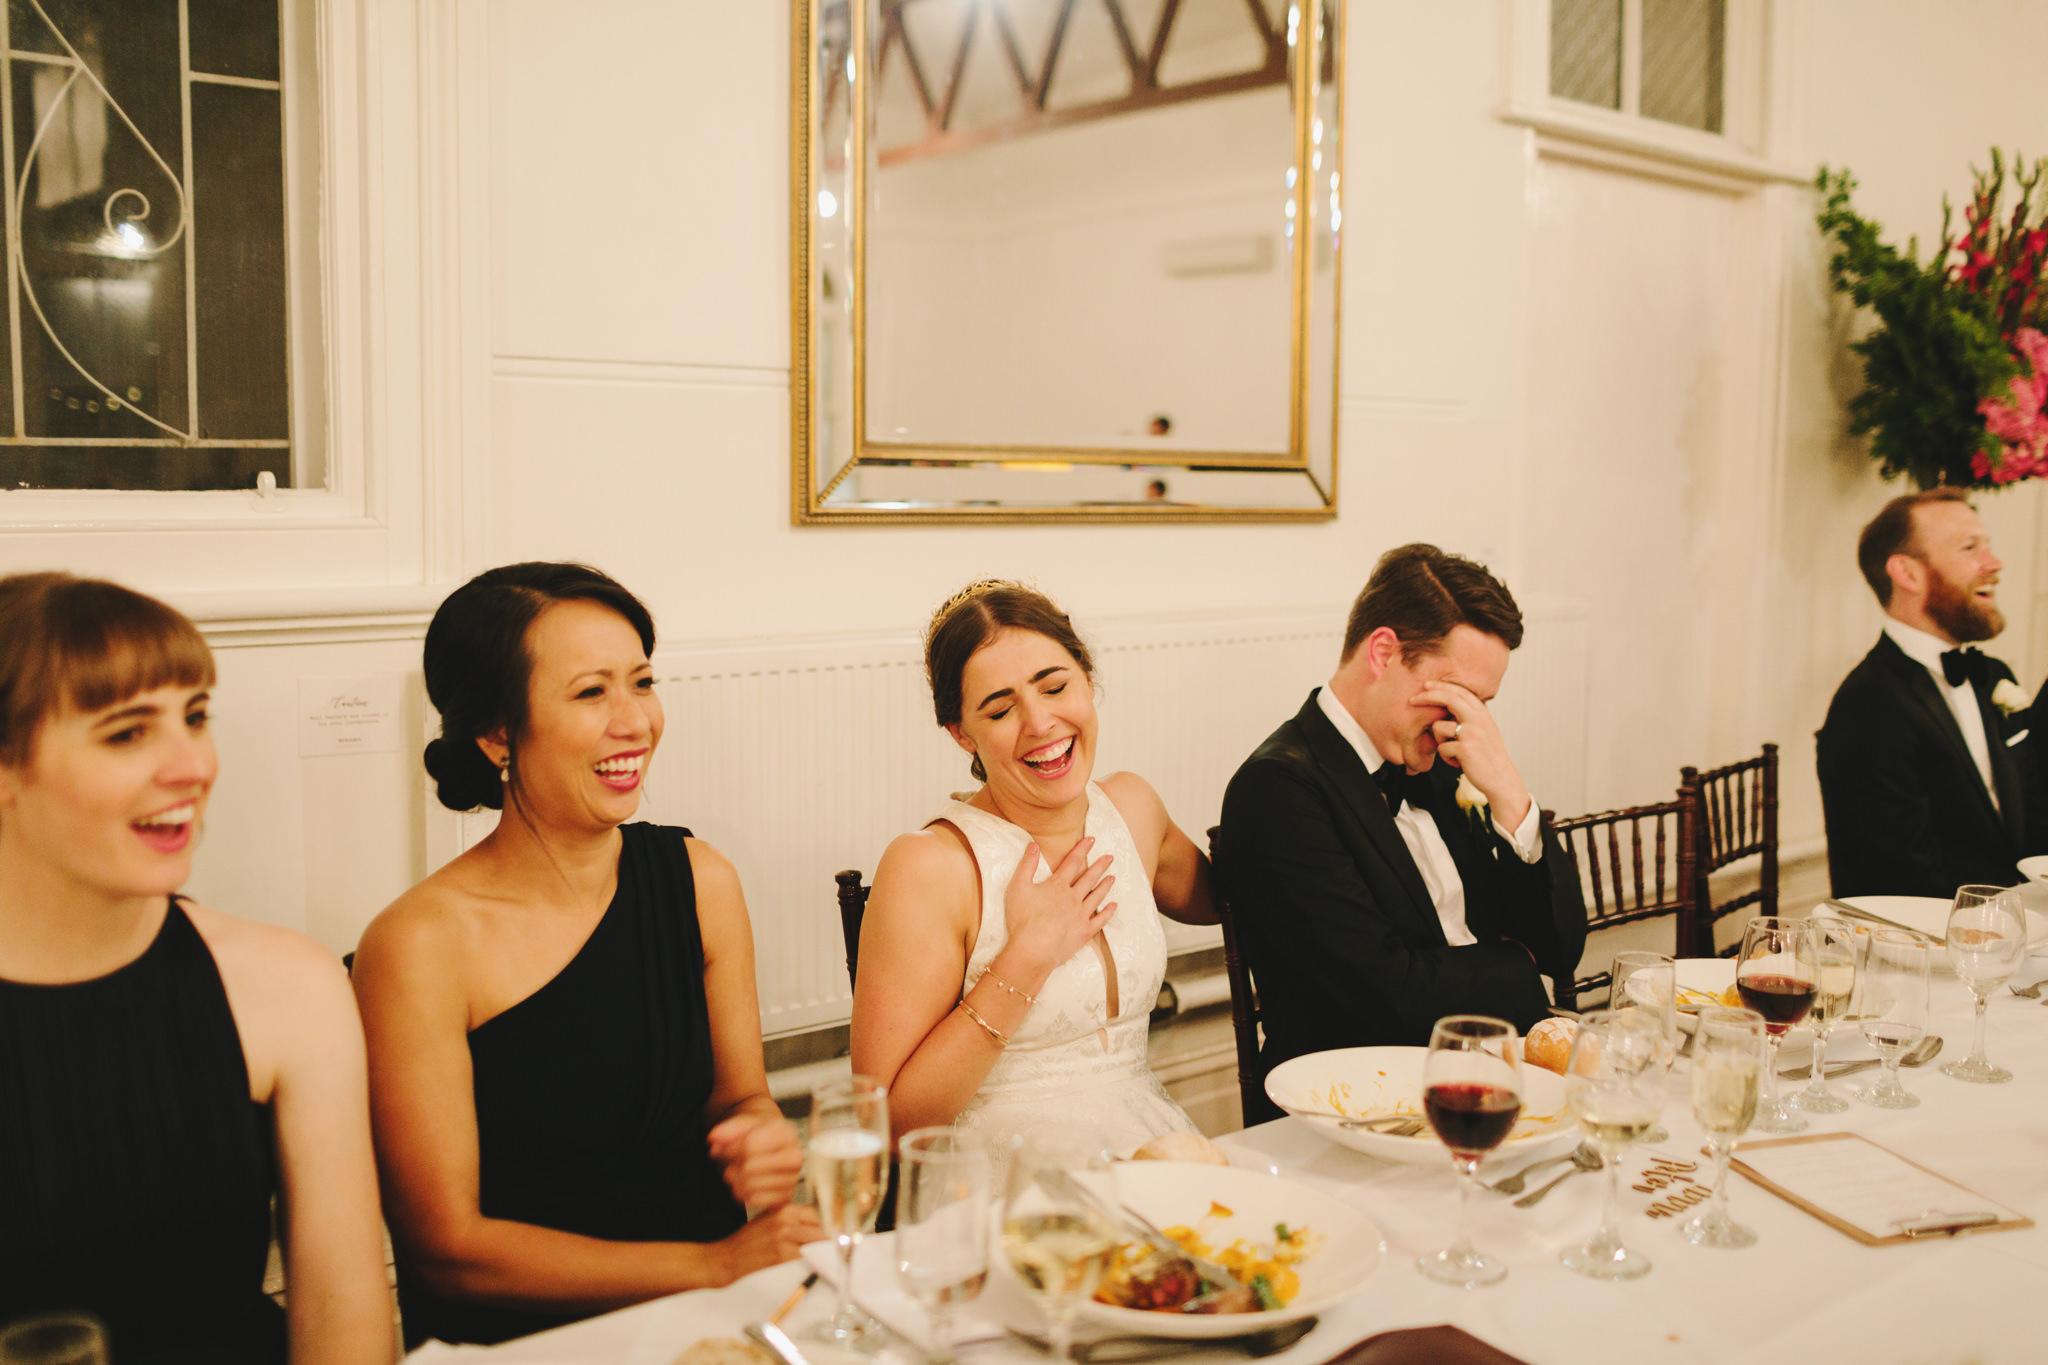 Abbotsford_Convent_Wedding_Peter_Anna120.JPG